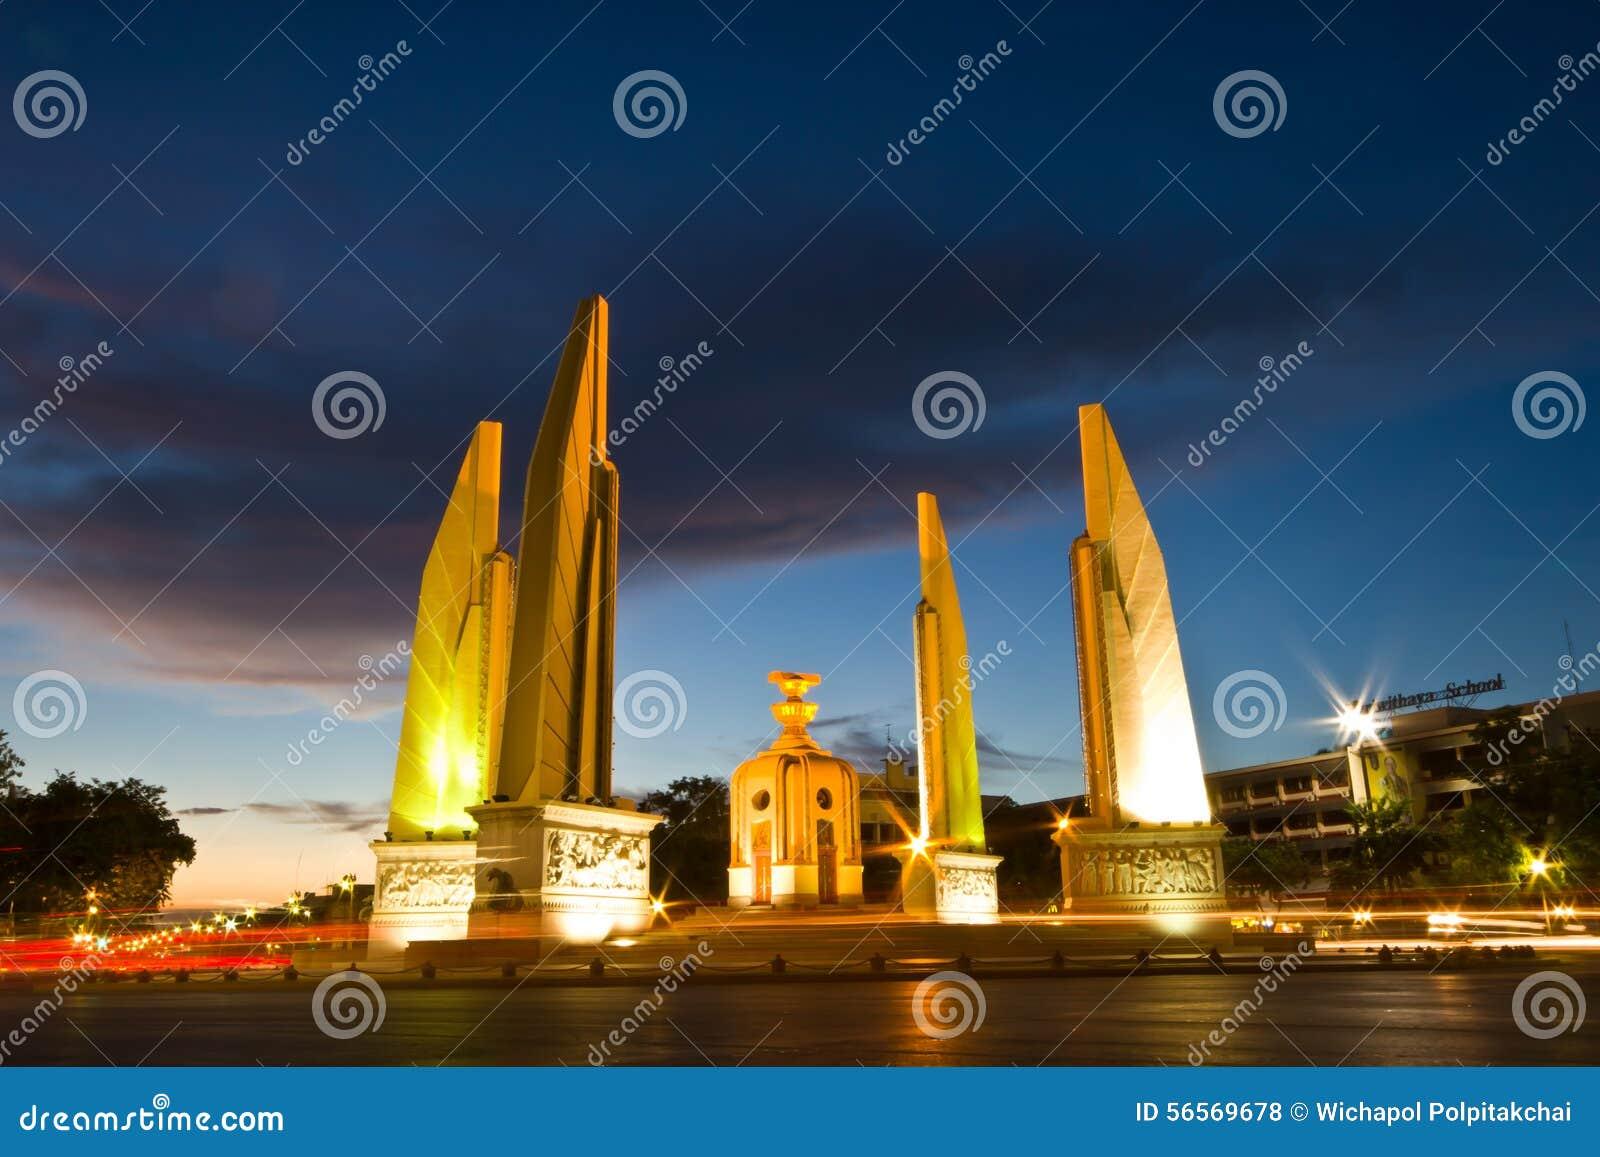 Download Μνημείο δημοκρατίας της Μπανγκόκ, Ταϊλάνδη πυροβοληθείσα τη νύχτα Στοκ Εικόνες - εικόνα από τουρίστας, πεζοδρόμιο: 56569678